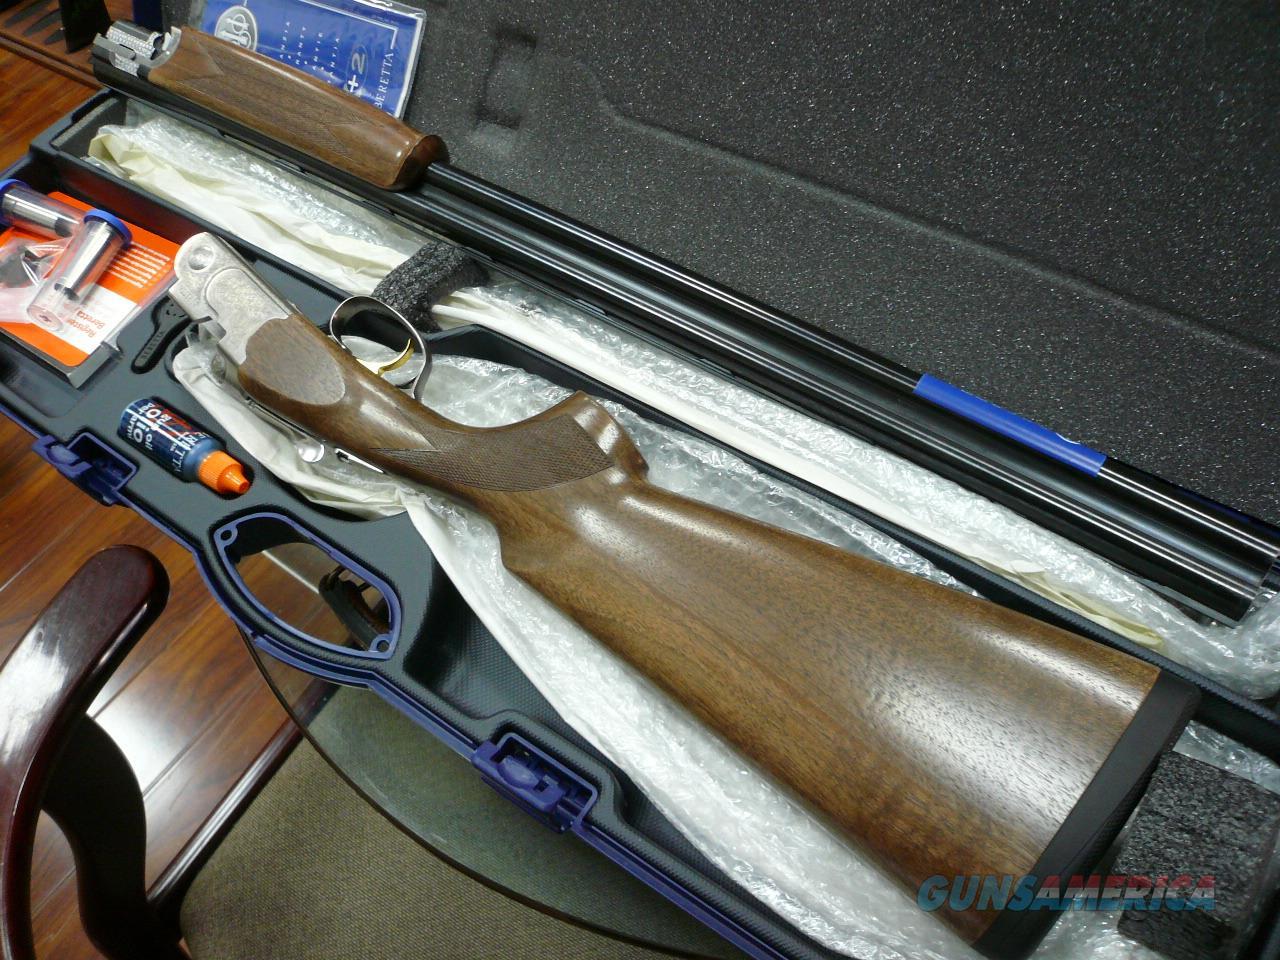 "686 Silver Pigeon 1 20Ga,29 1/2""bbl,NIB  Guns > Shotguns > Beretta Shotguns > O/U > Hunting"